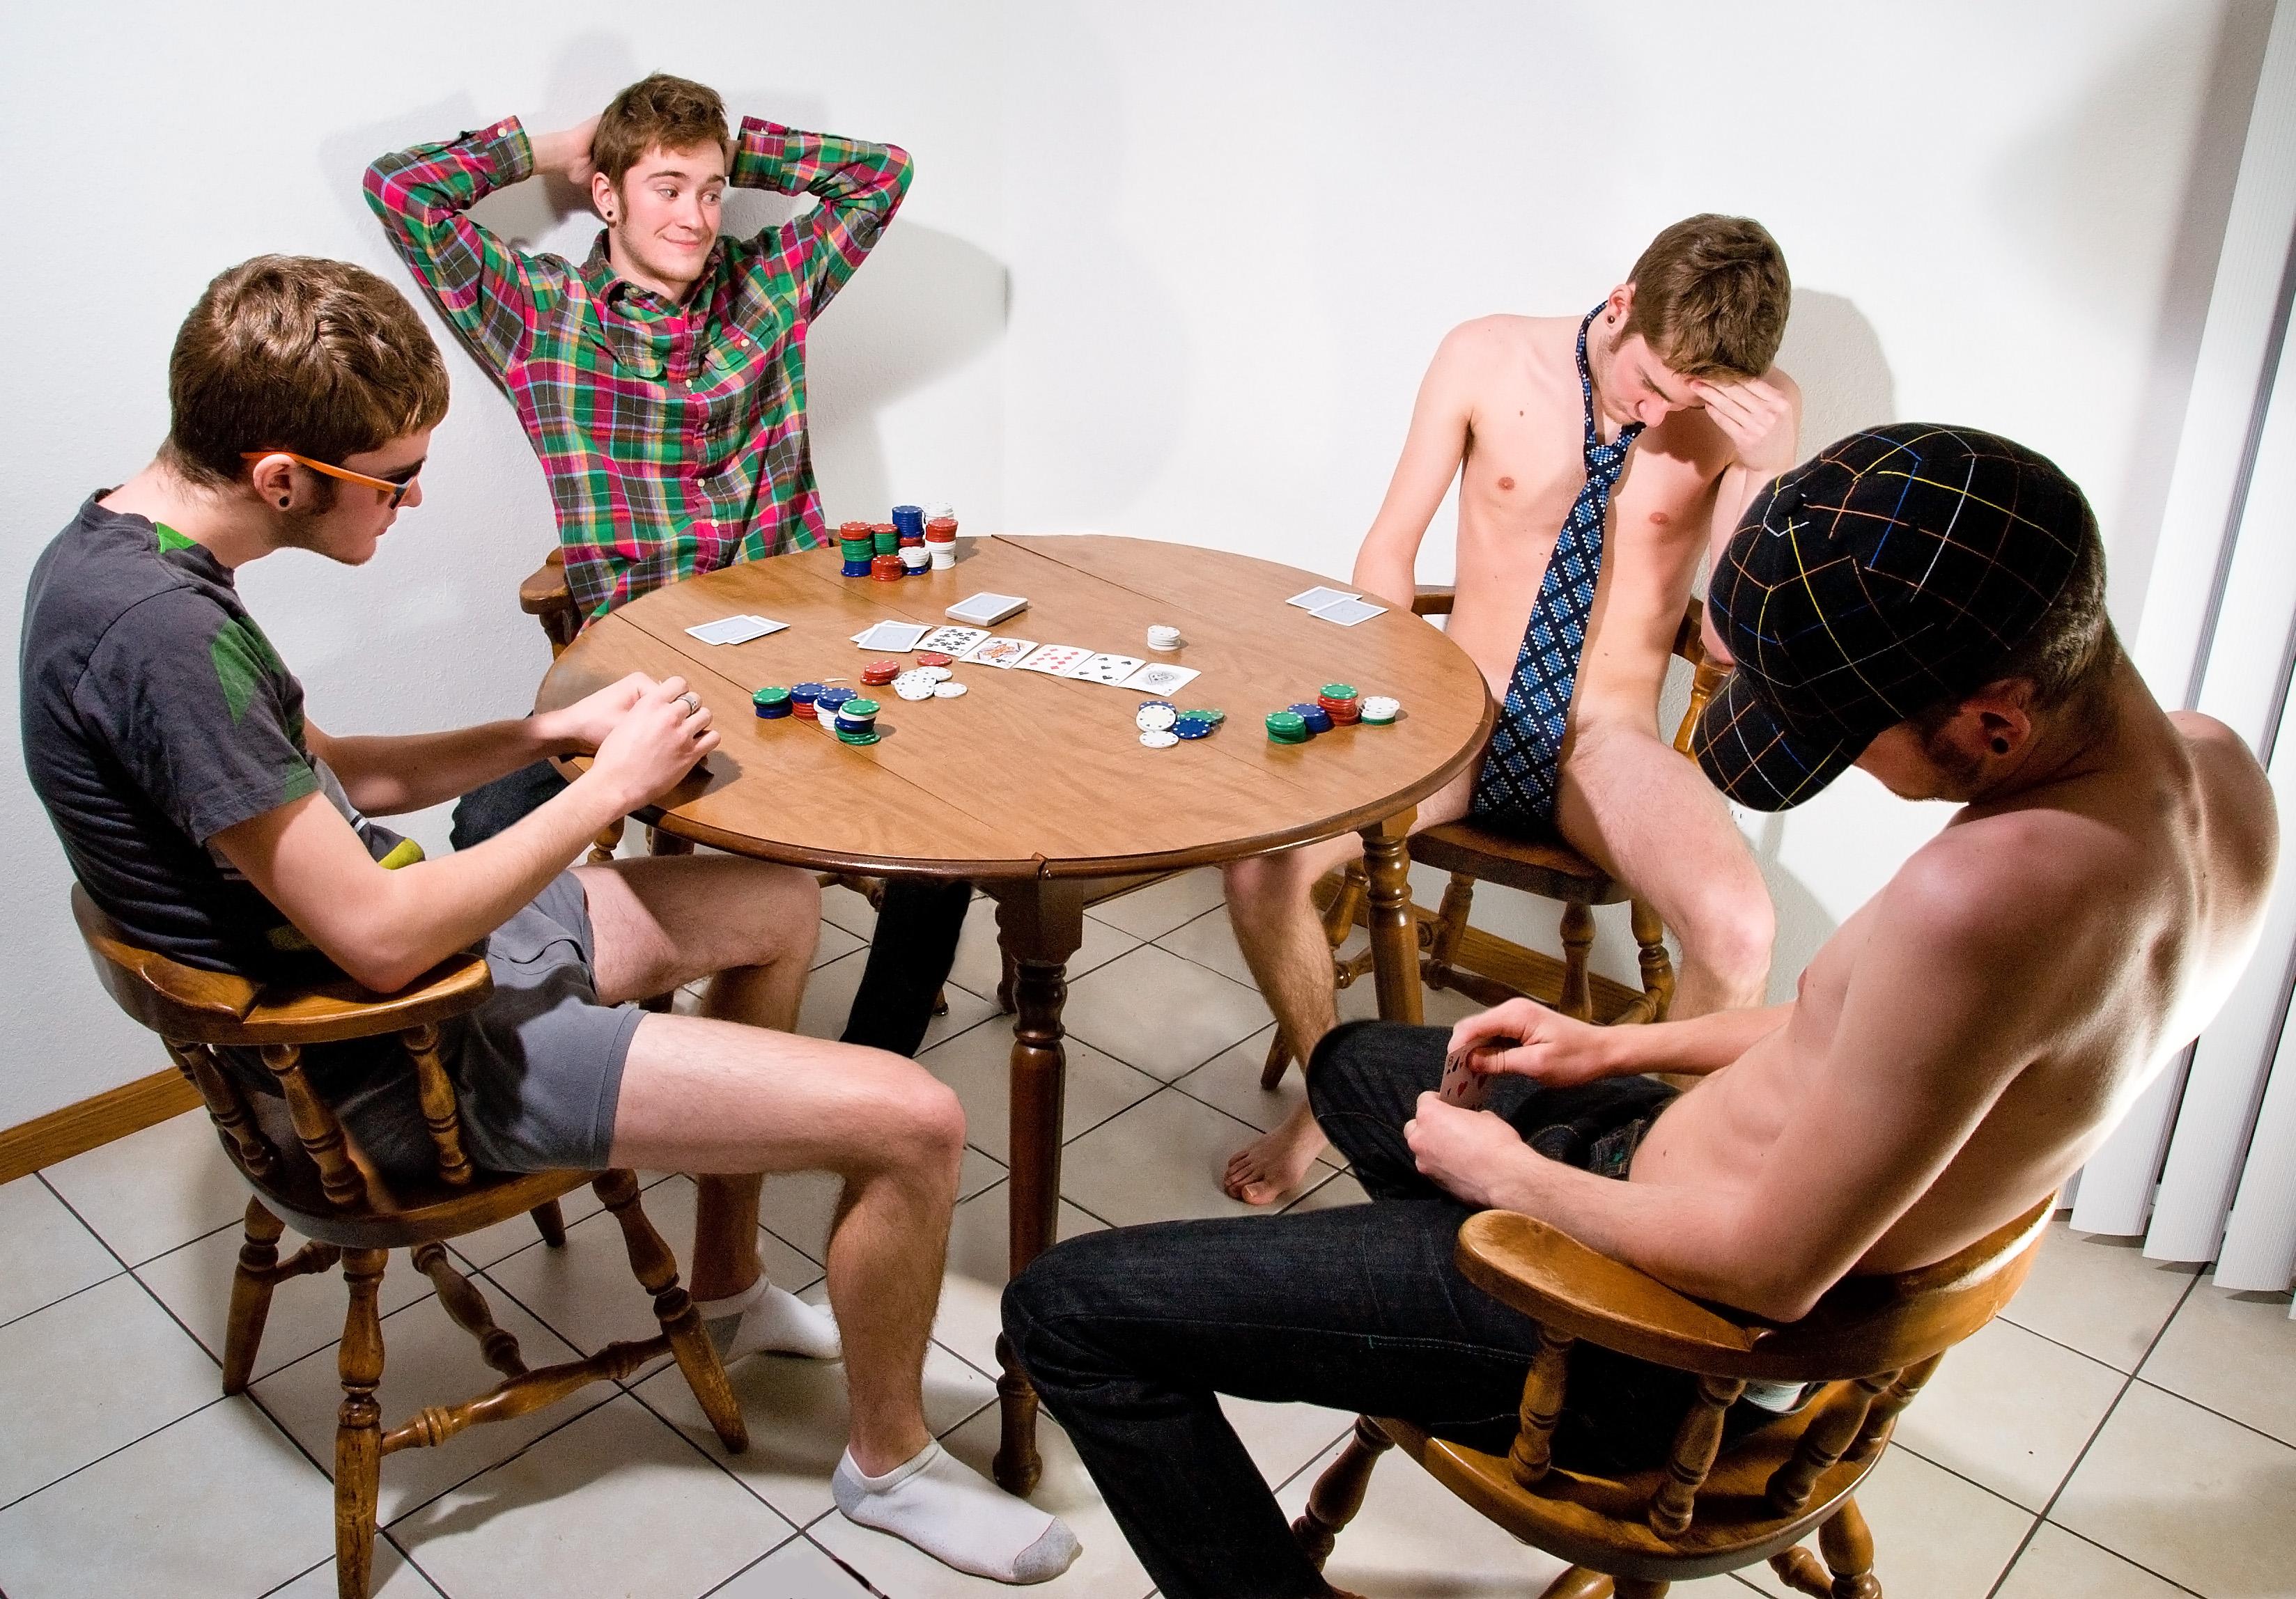 Guys playing strip poker and get hard